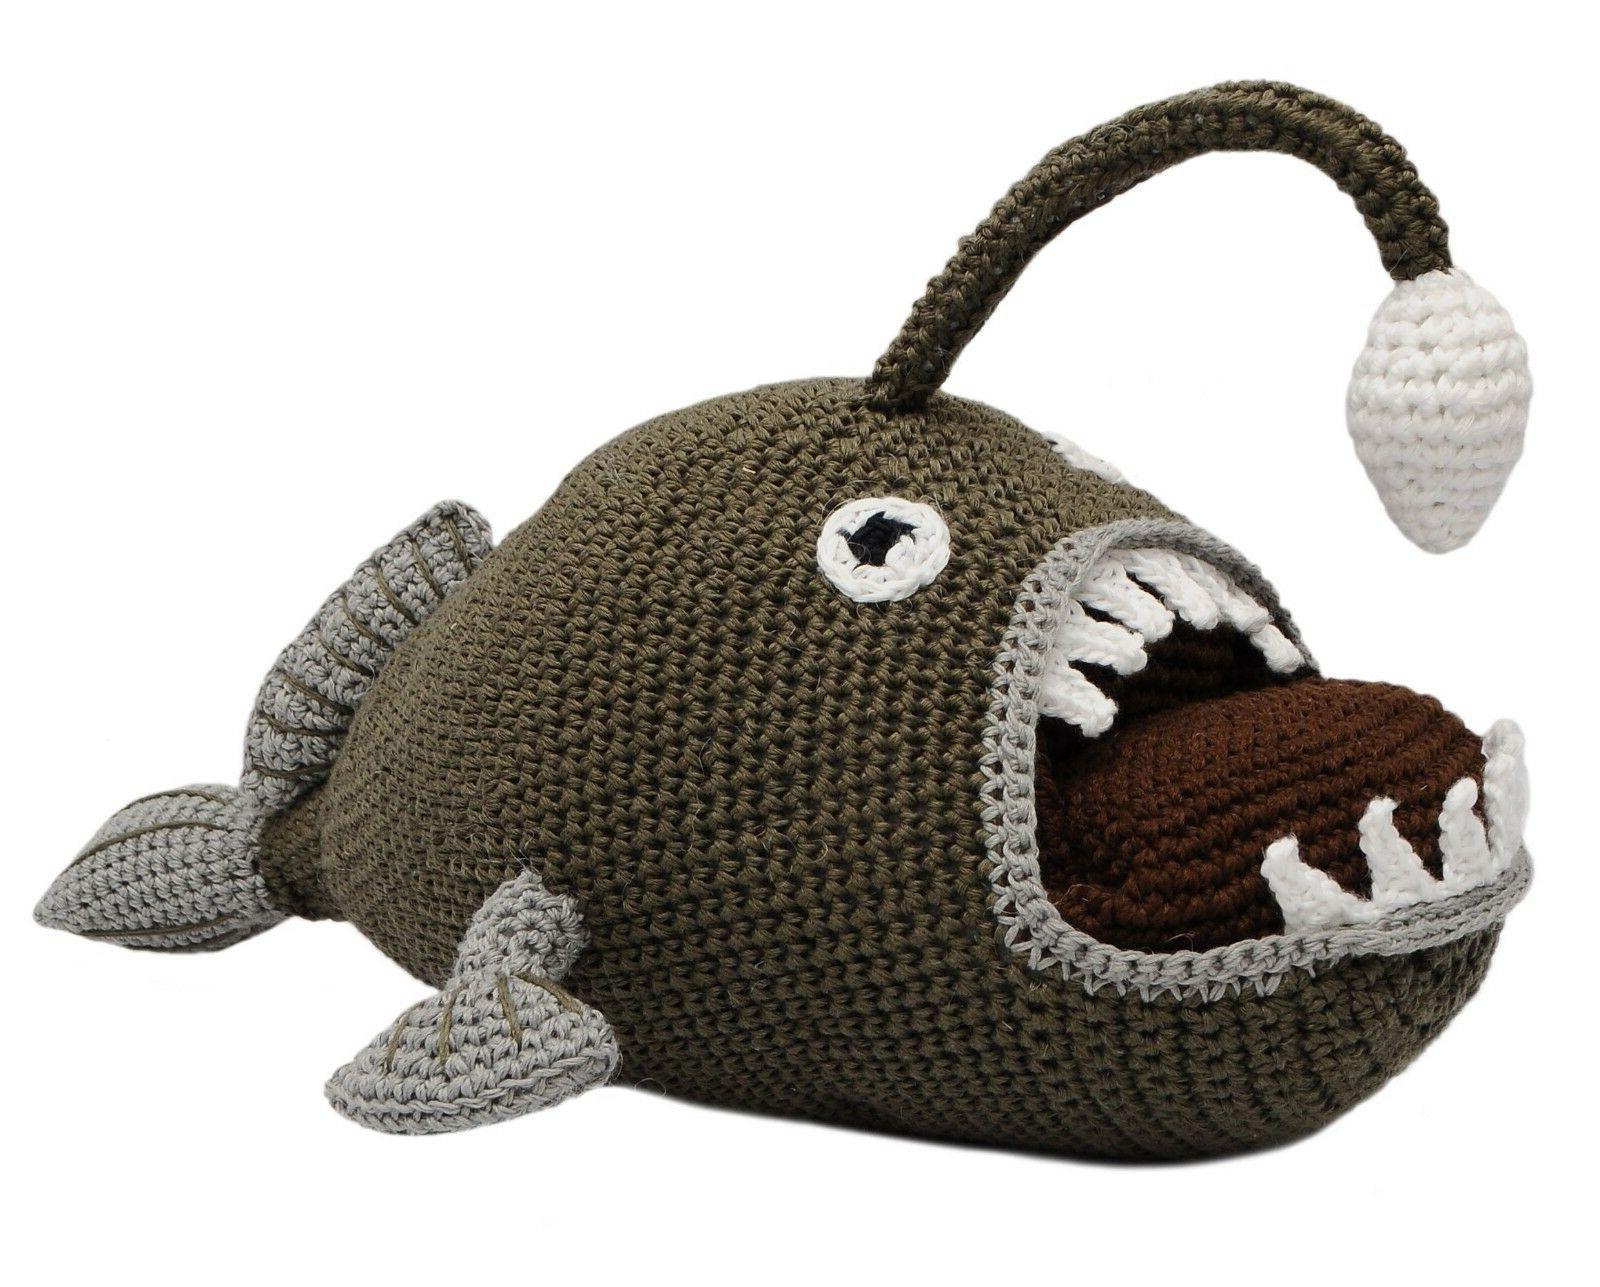 anglerfish hand knitted doll angler fish handmade